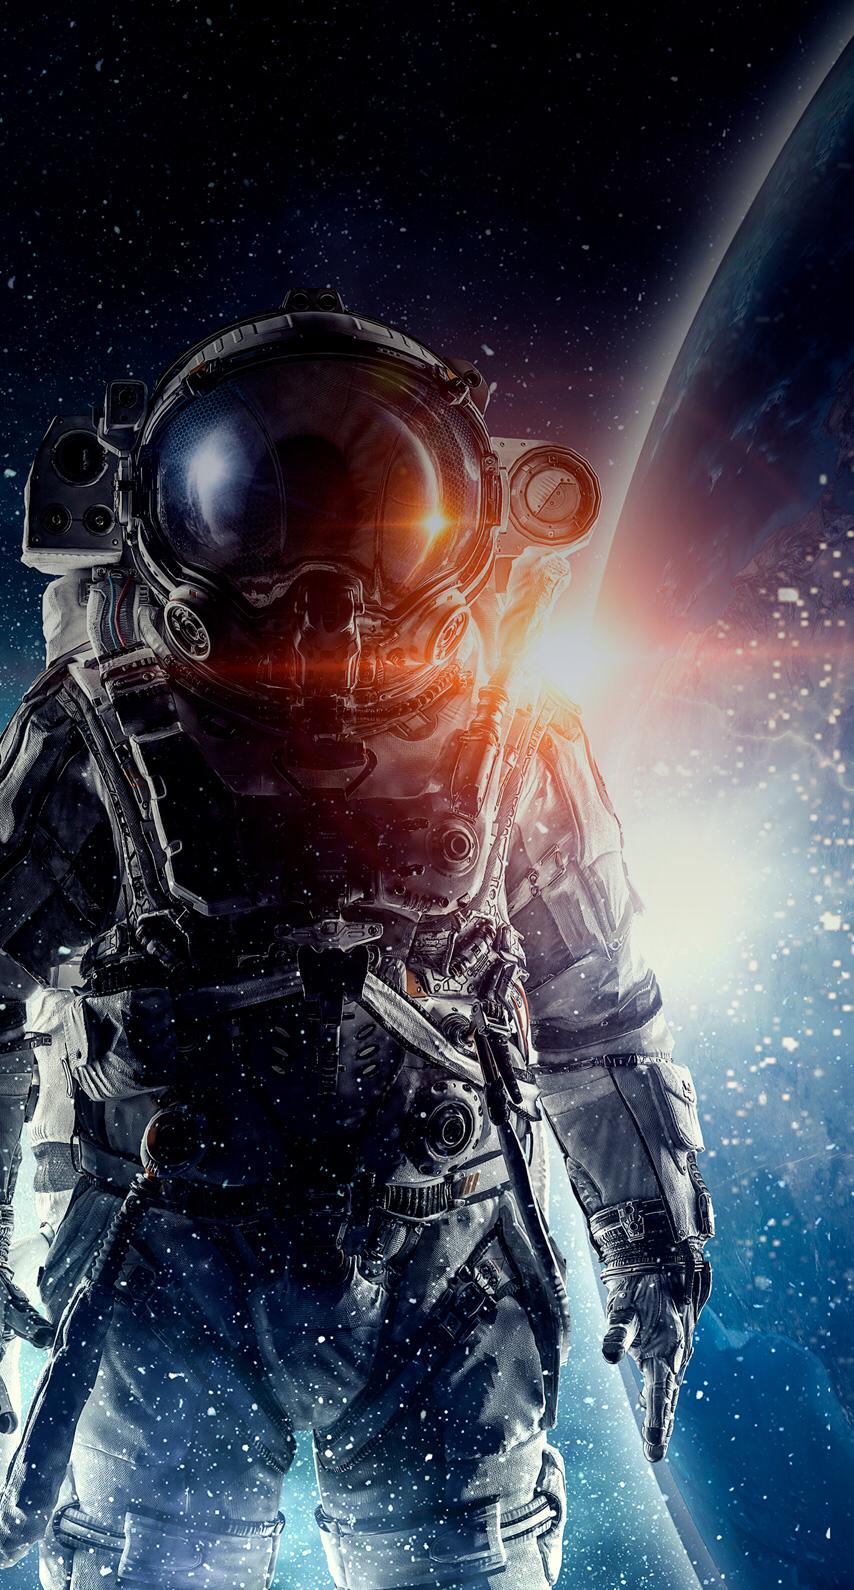 This Photo Of The Astronaut In Space Looks Amazing Desenho De Astronauta Papel De Parede De Astronauta Ilustracao Do Espaco